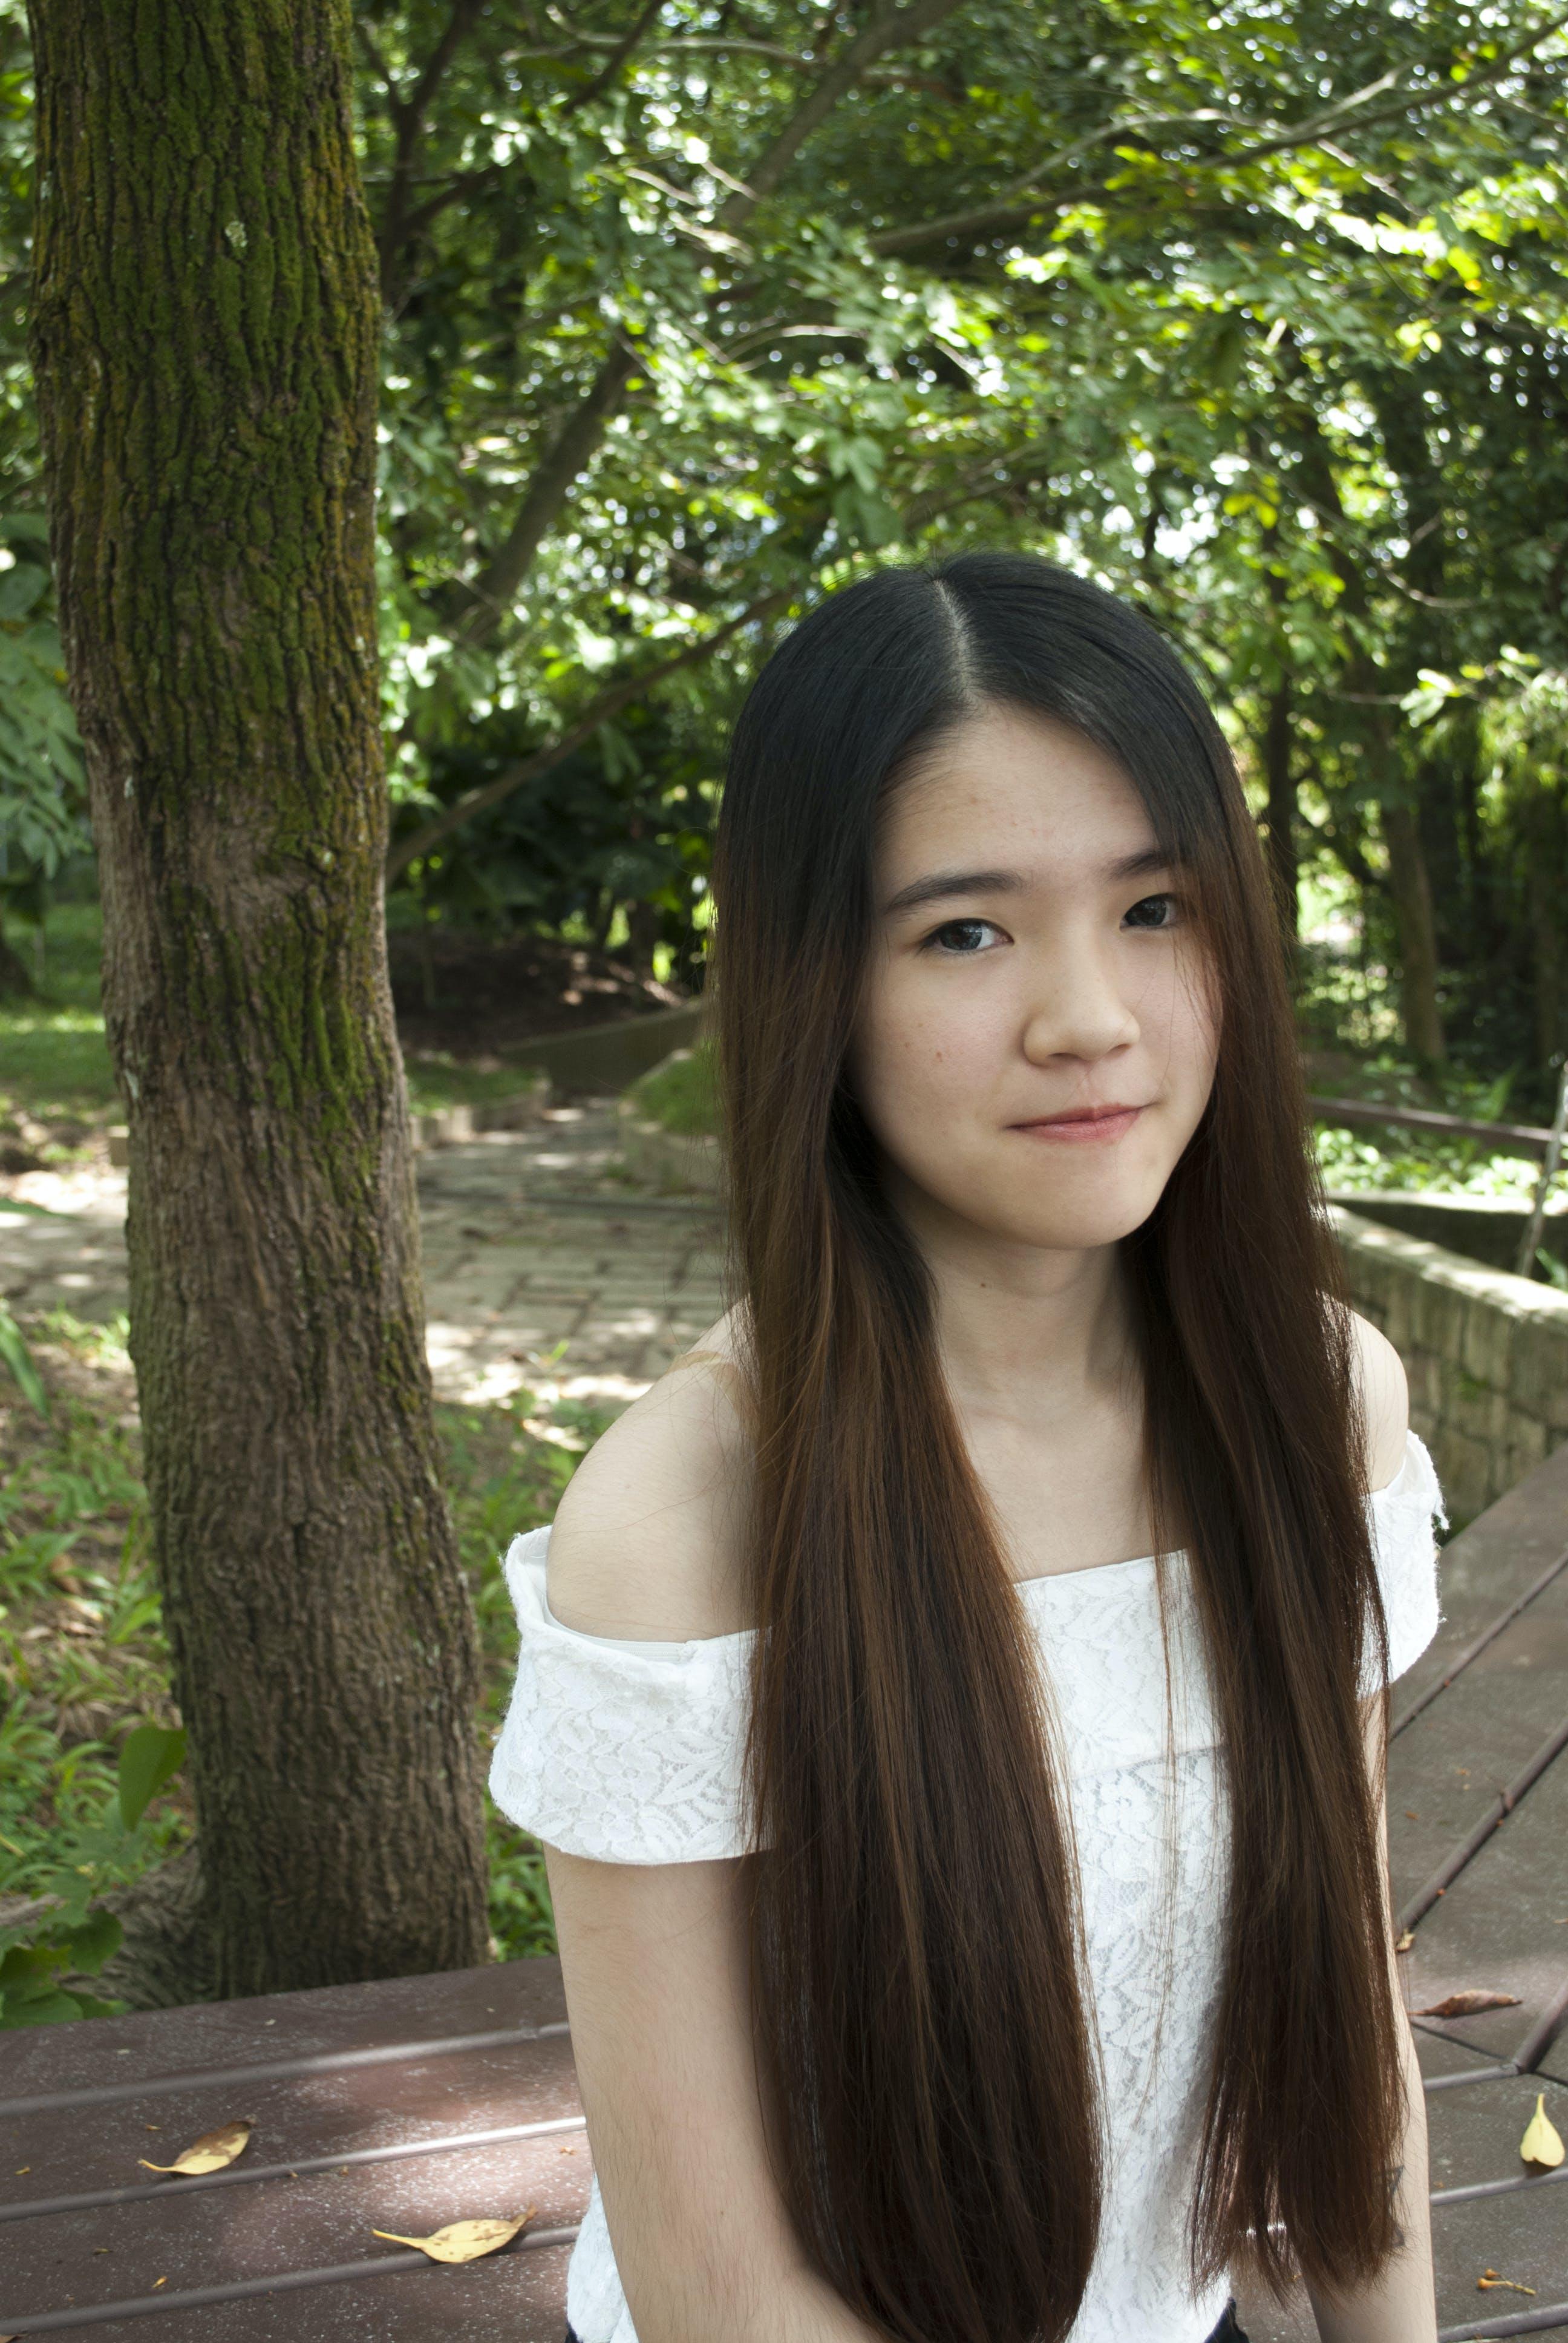 Free stock photo of long hair, natural, park, young